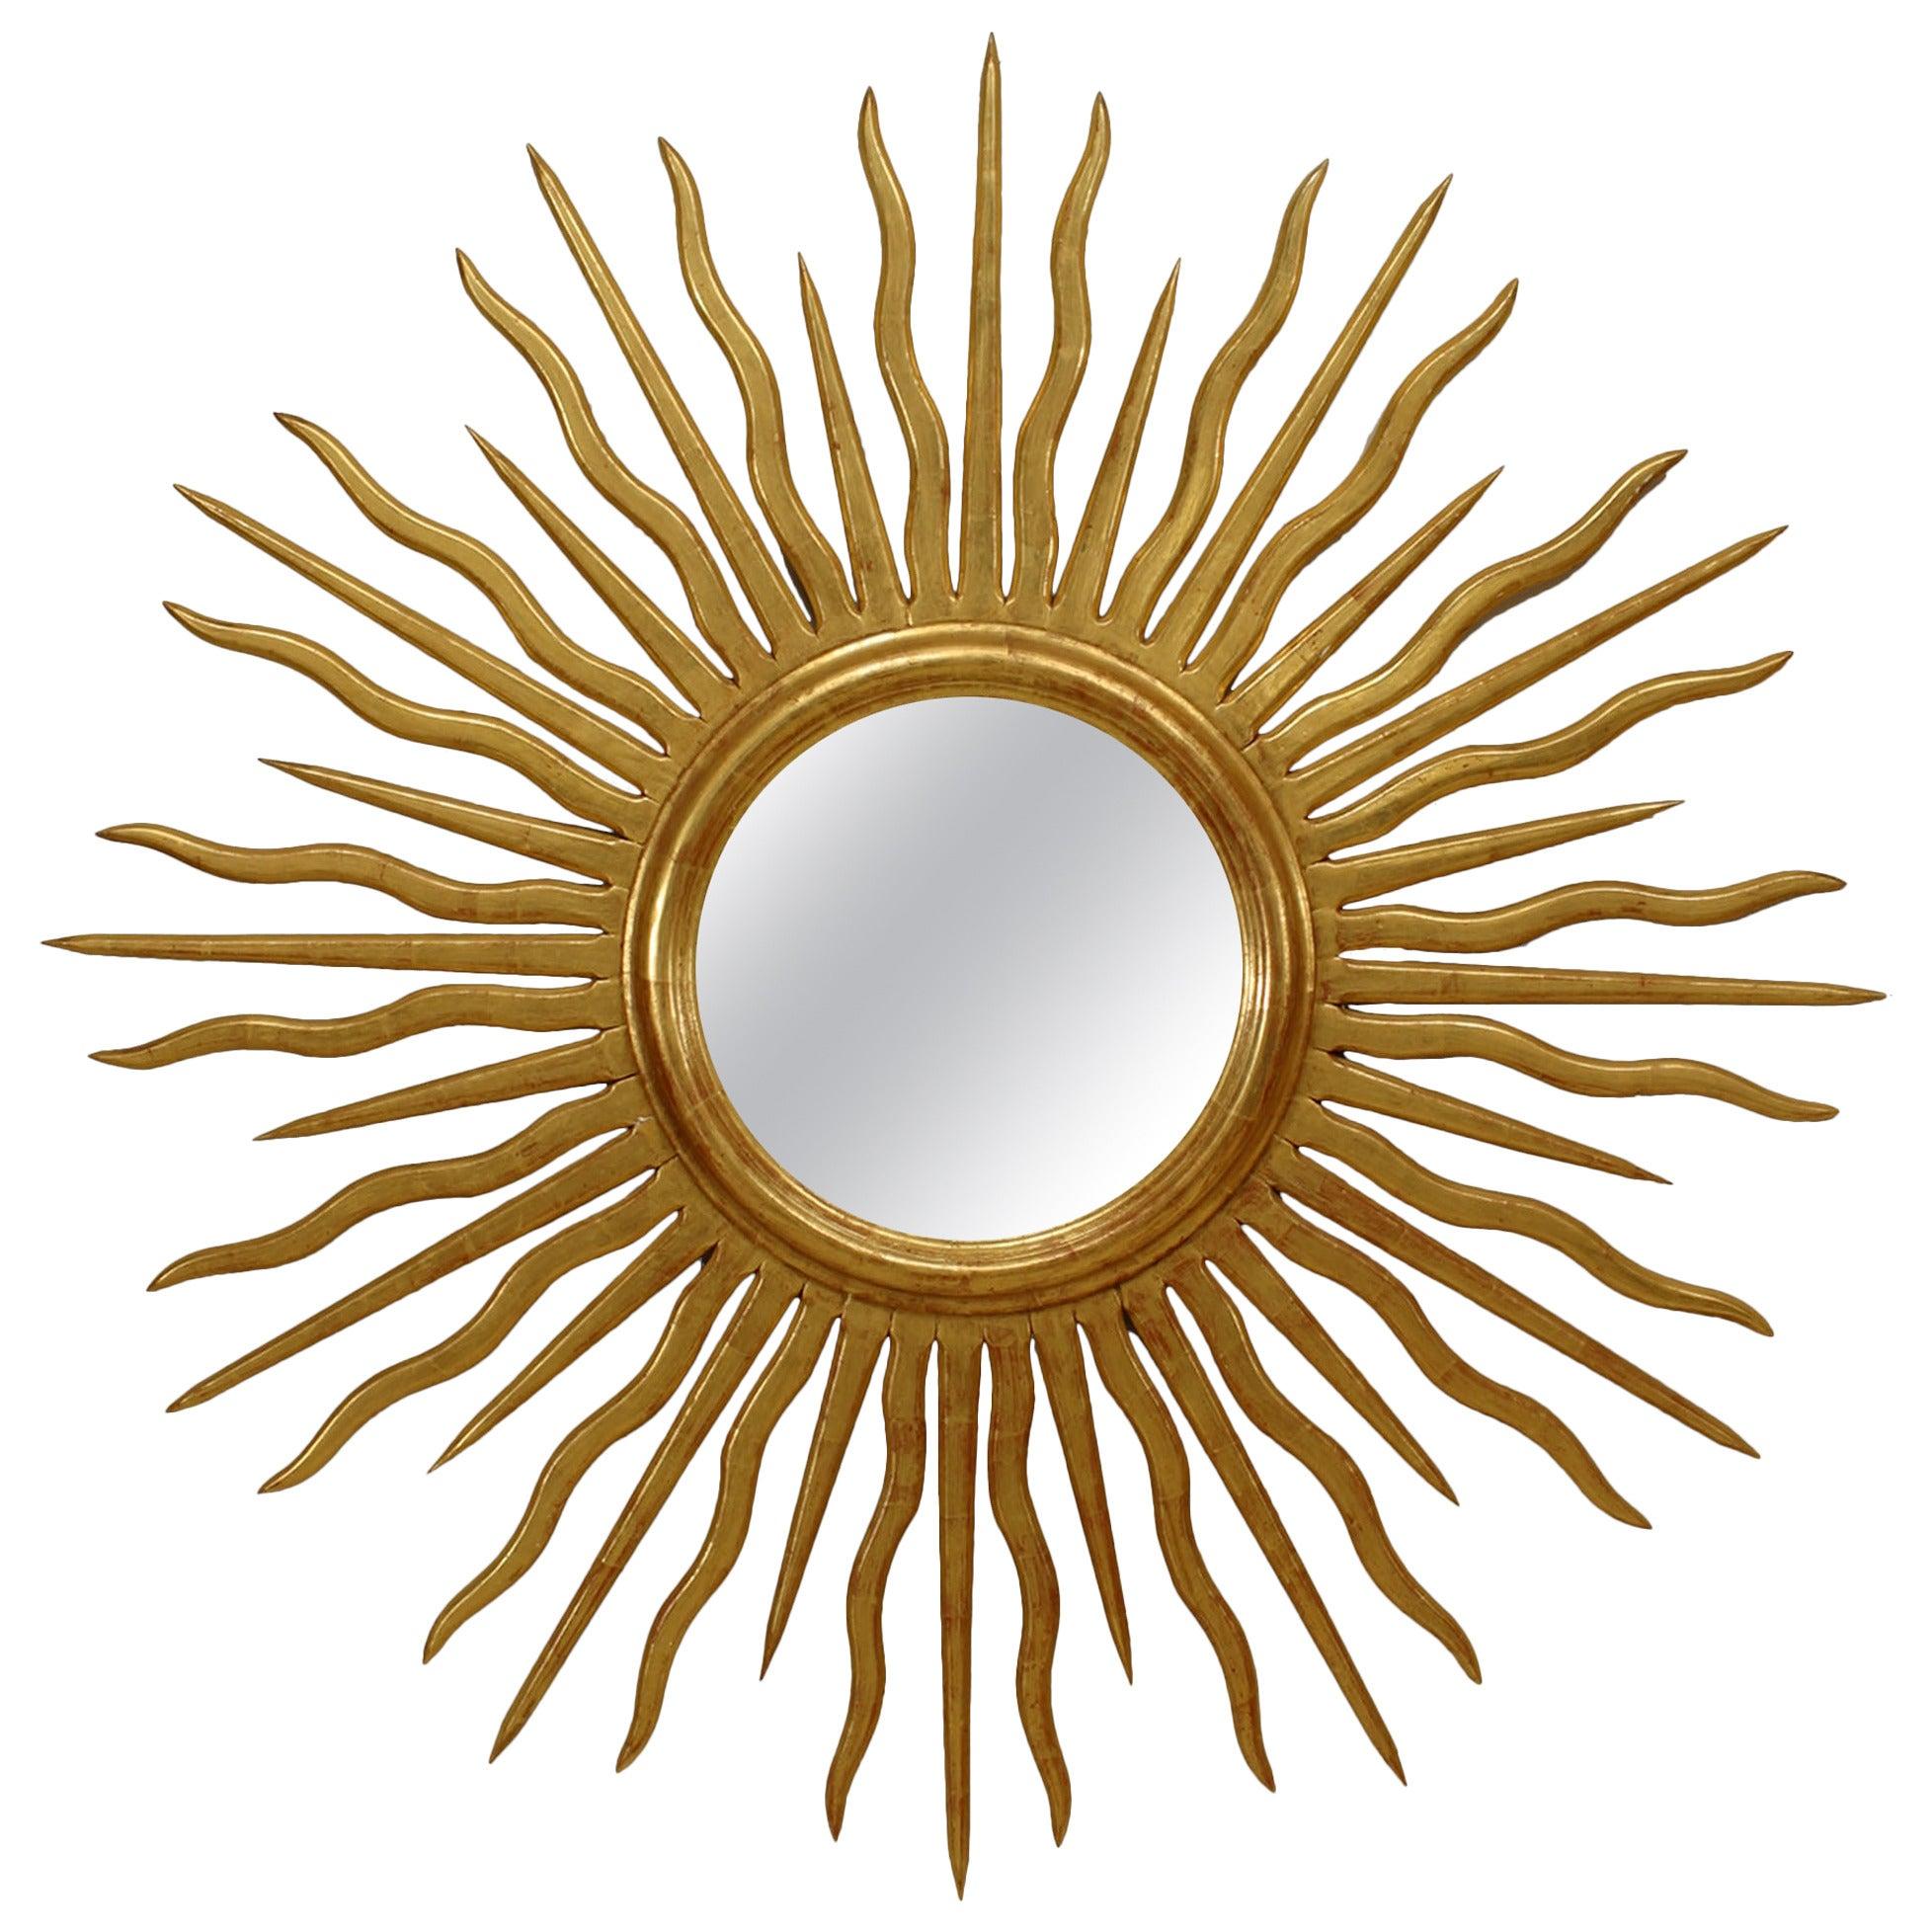 French Mid-Century Giltwood Sunburst Wall Mirror